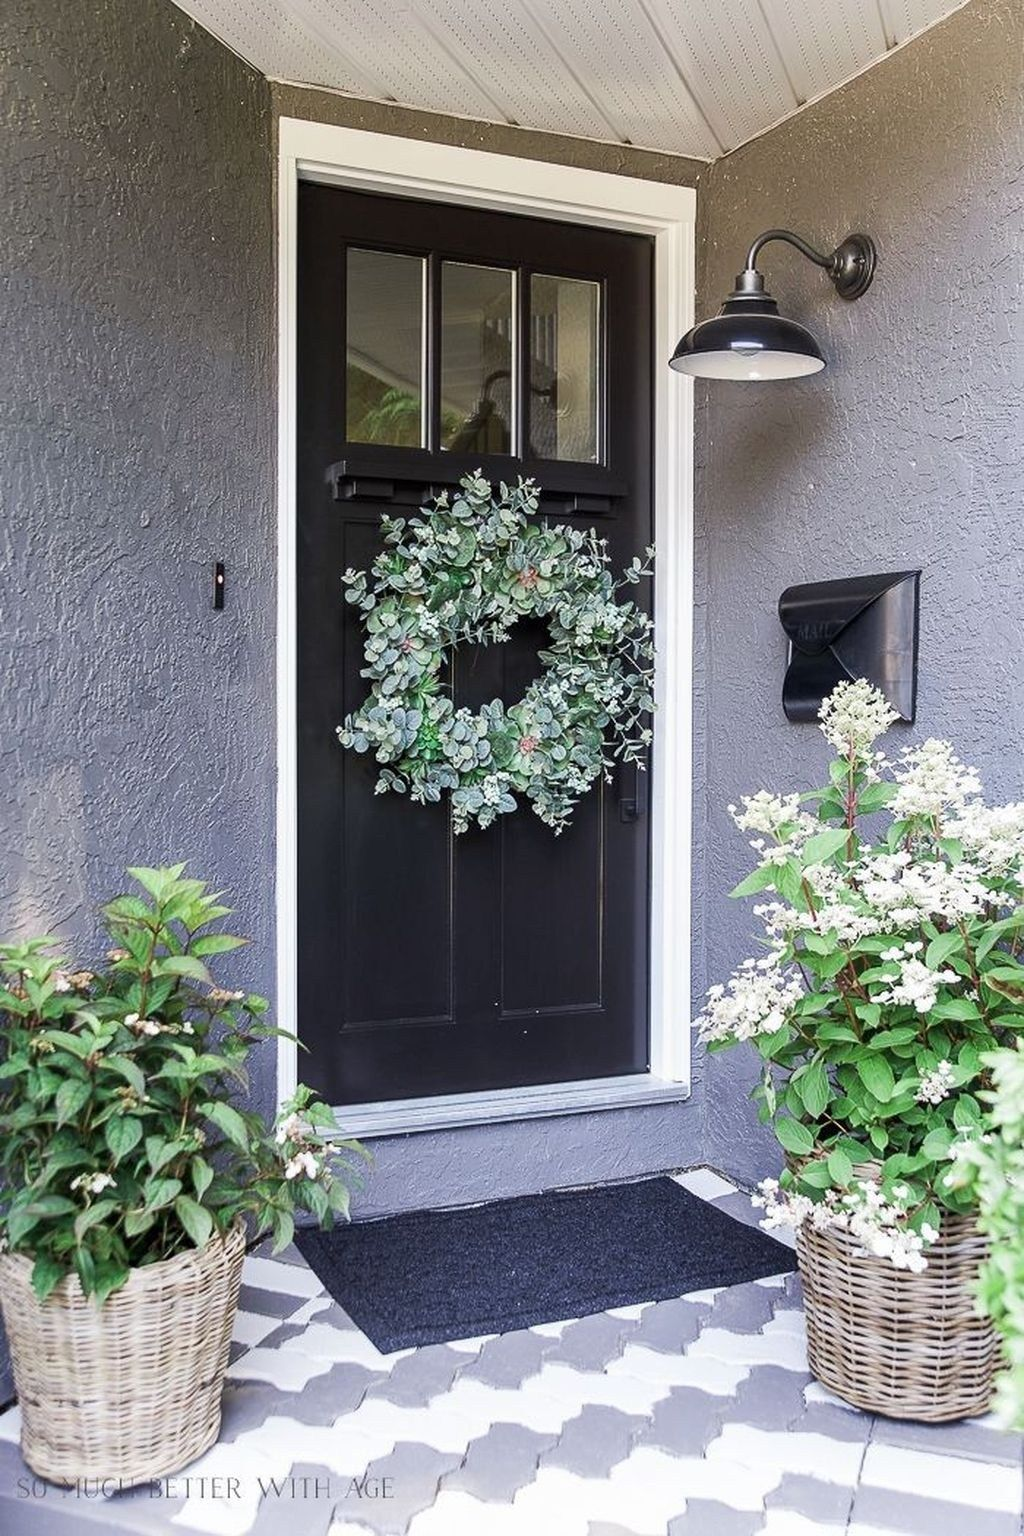 53 Unique Apartment Small Porch Decorating Ideas #smallporchdecorating